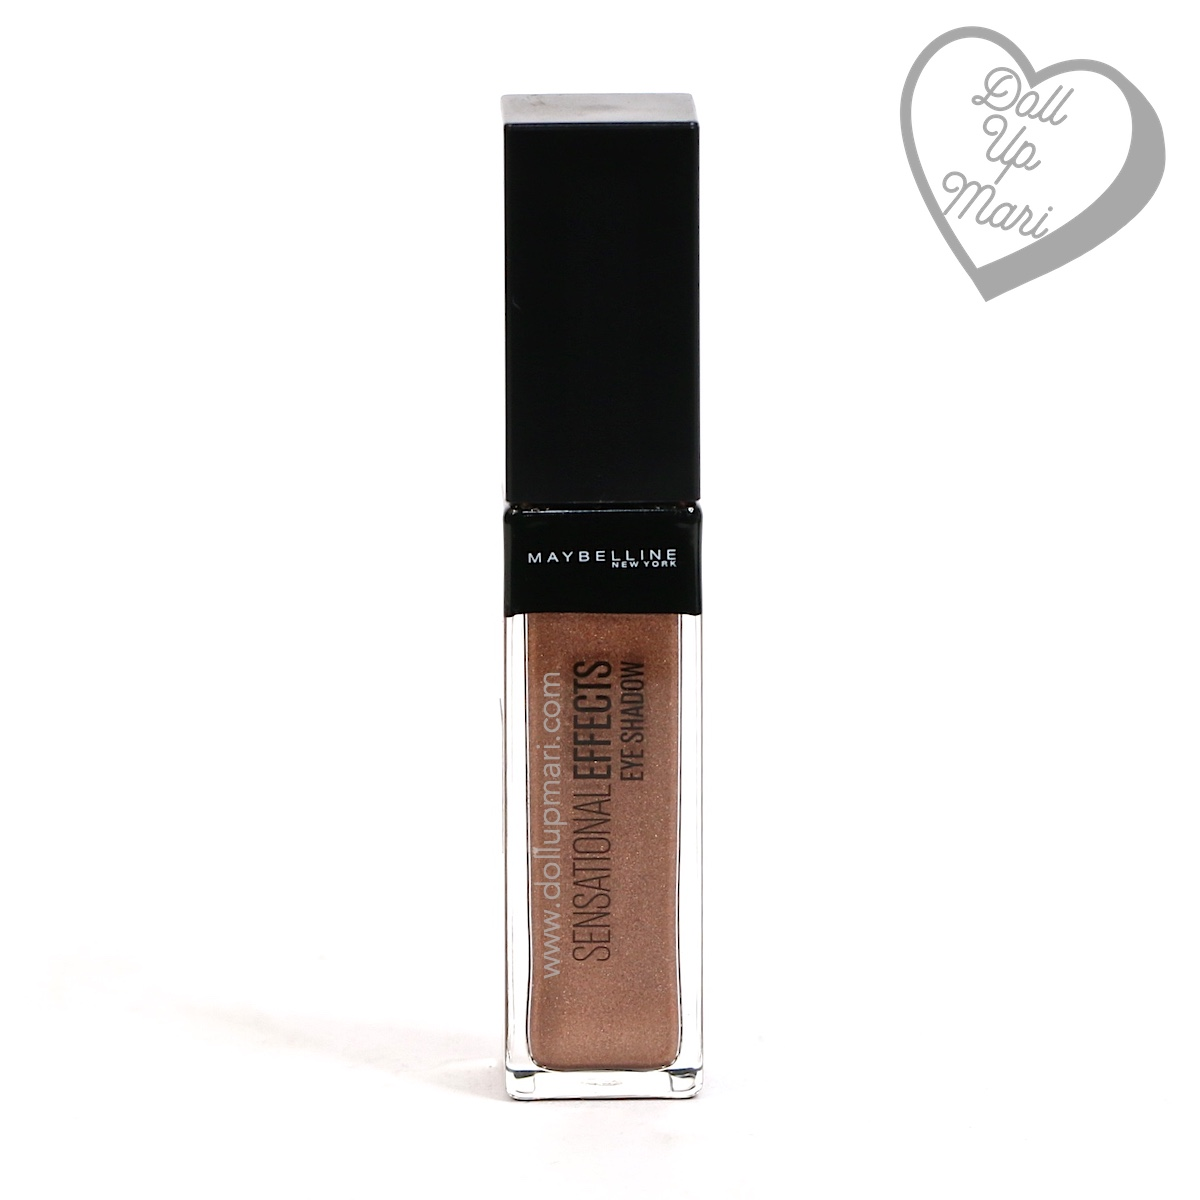 Maybelline Sensational Effects Liquid Eyeshadow S04 Smoky Bronze Pack Shot